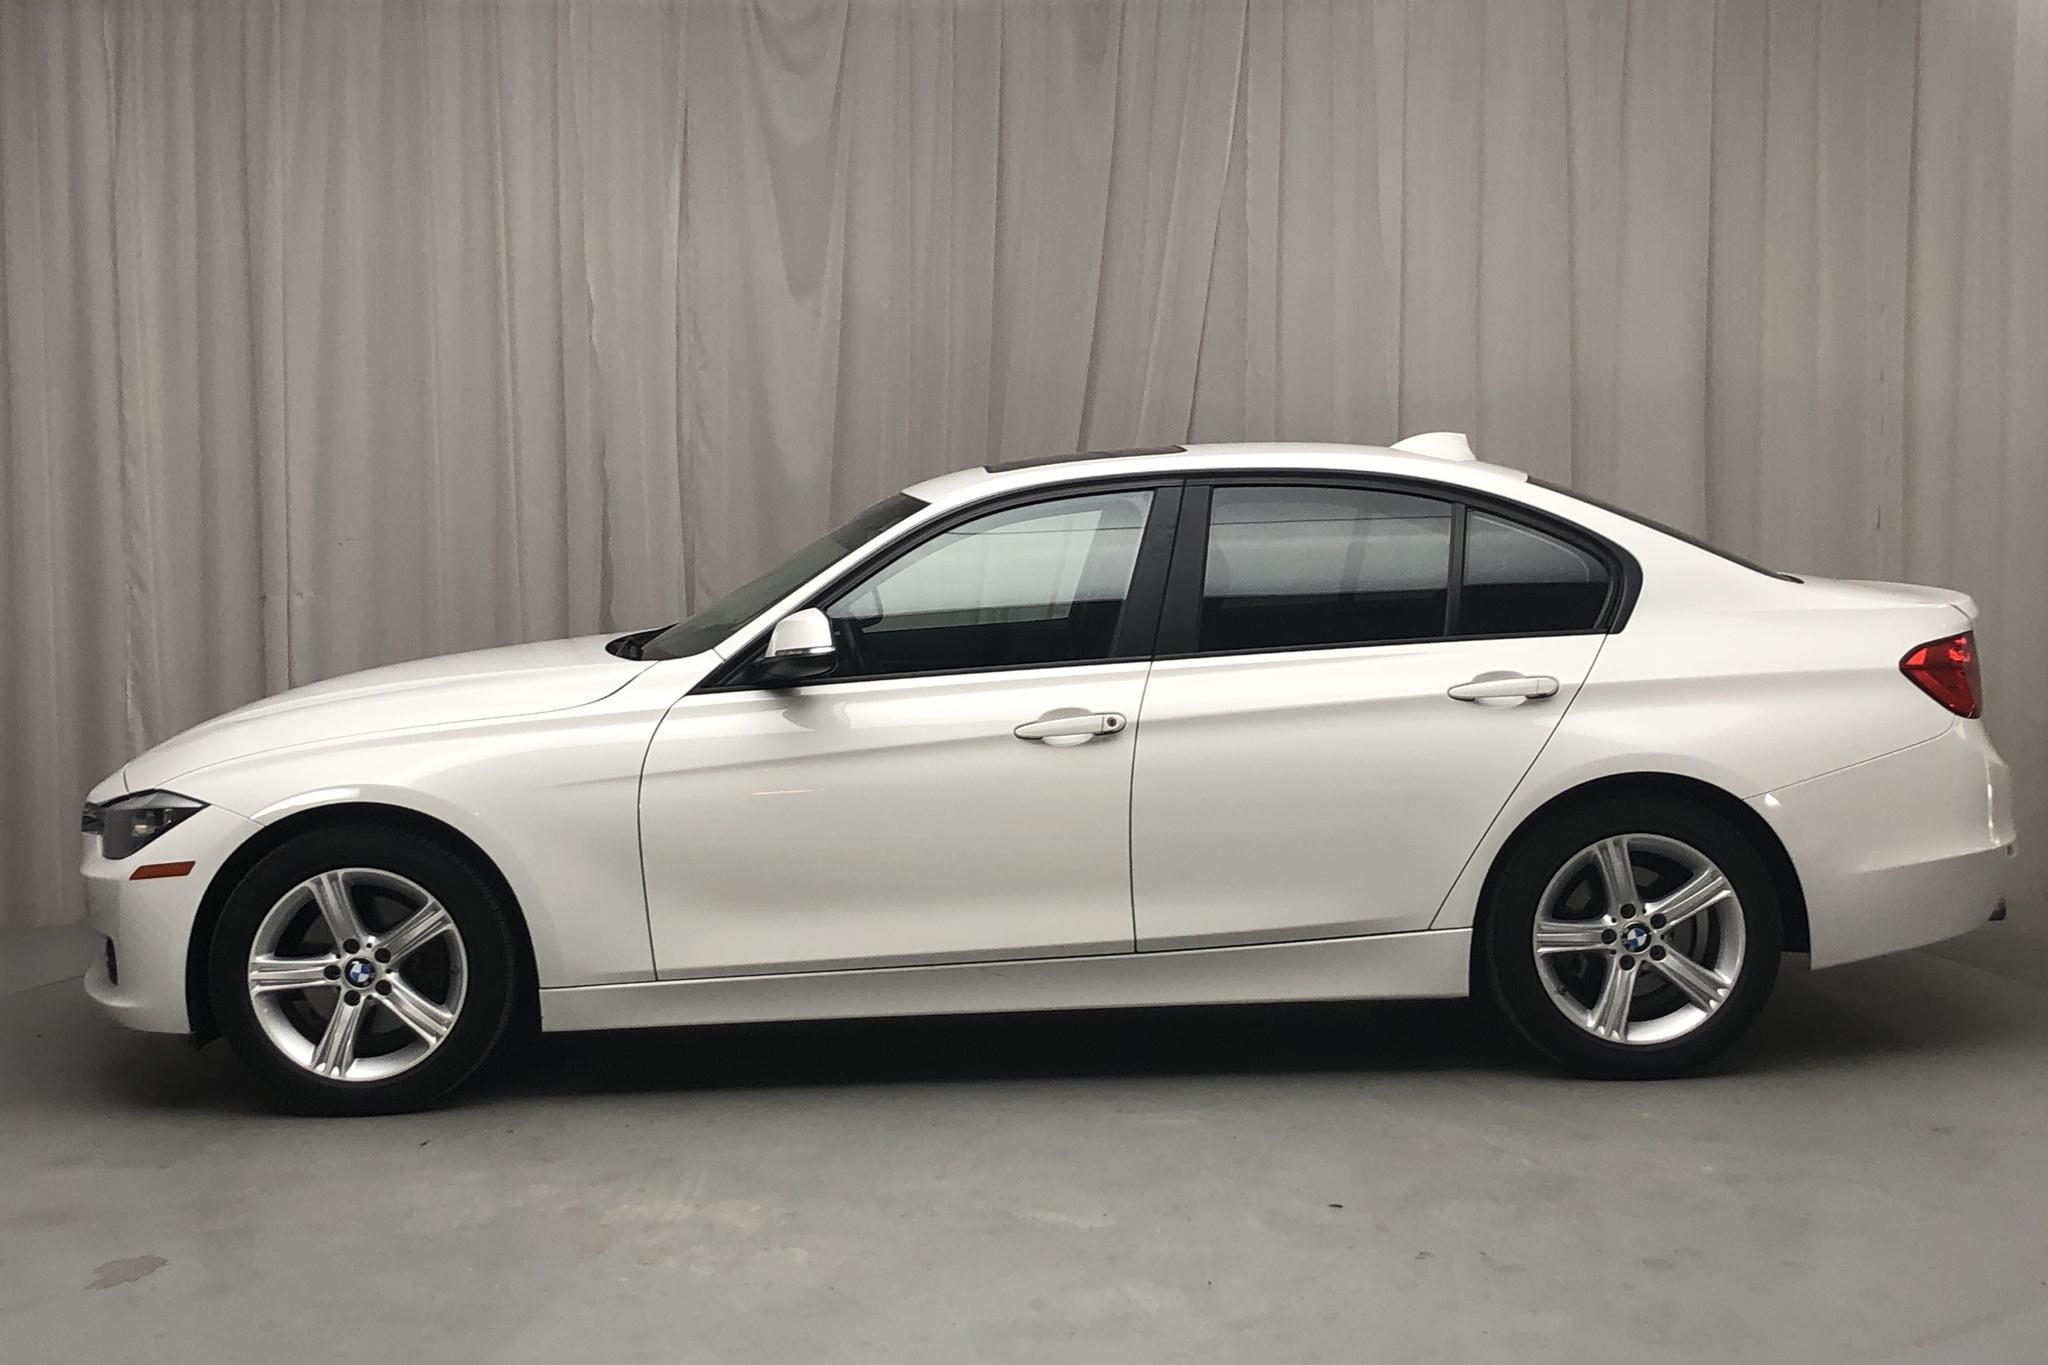 BMW 328i Sedan, F30 (245hk) - 11 260 mil - Automat - vit - 2014